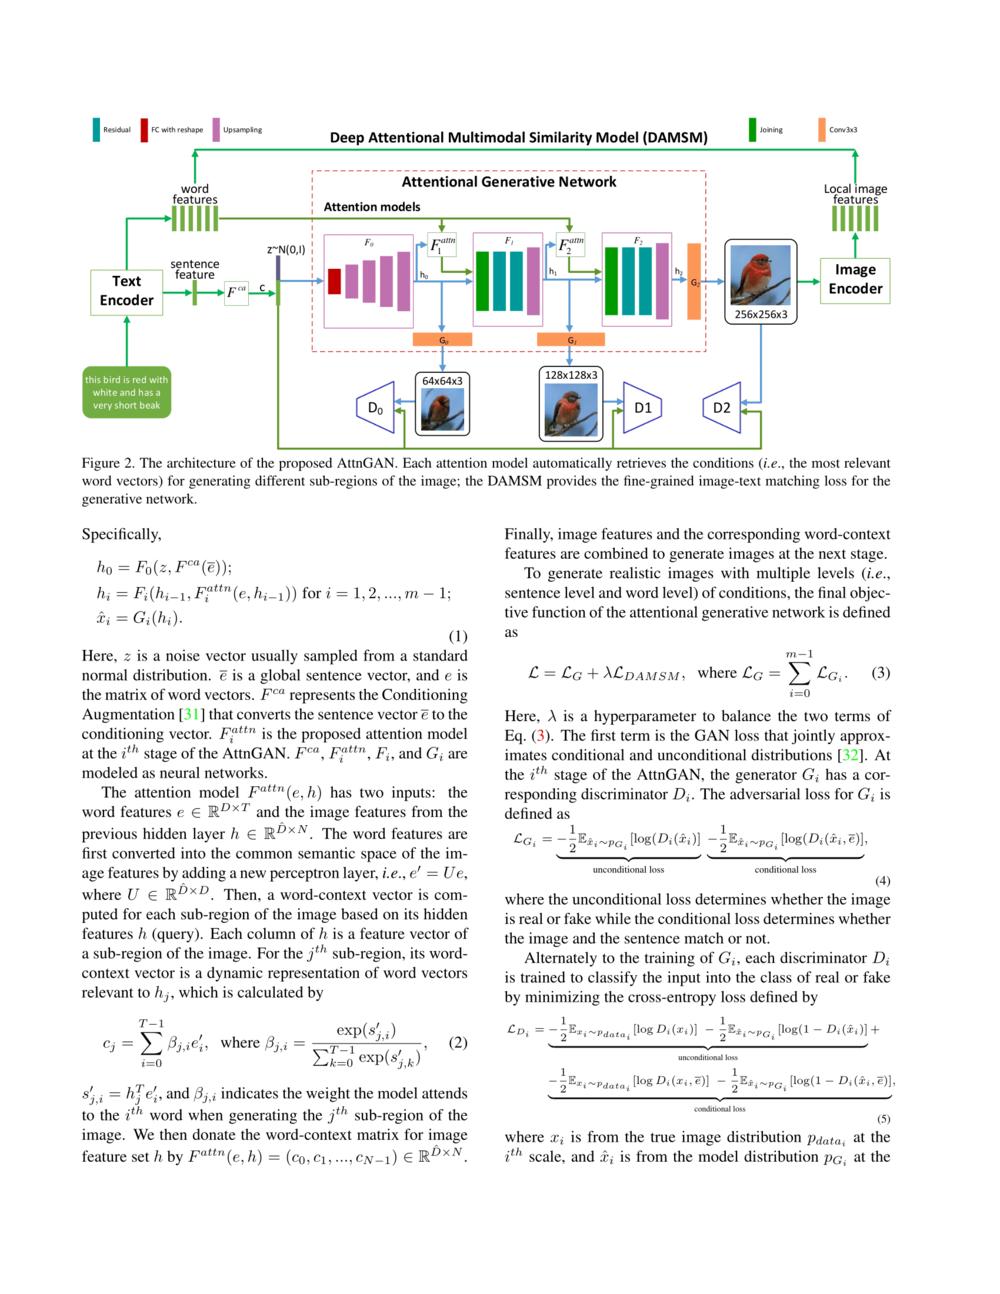 microsoft-researchers-build-a-bot-that-draws.001-3.png